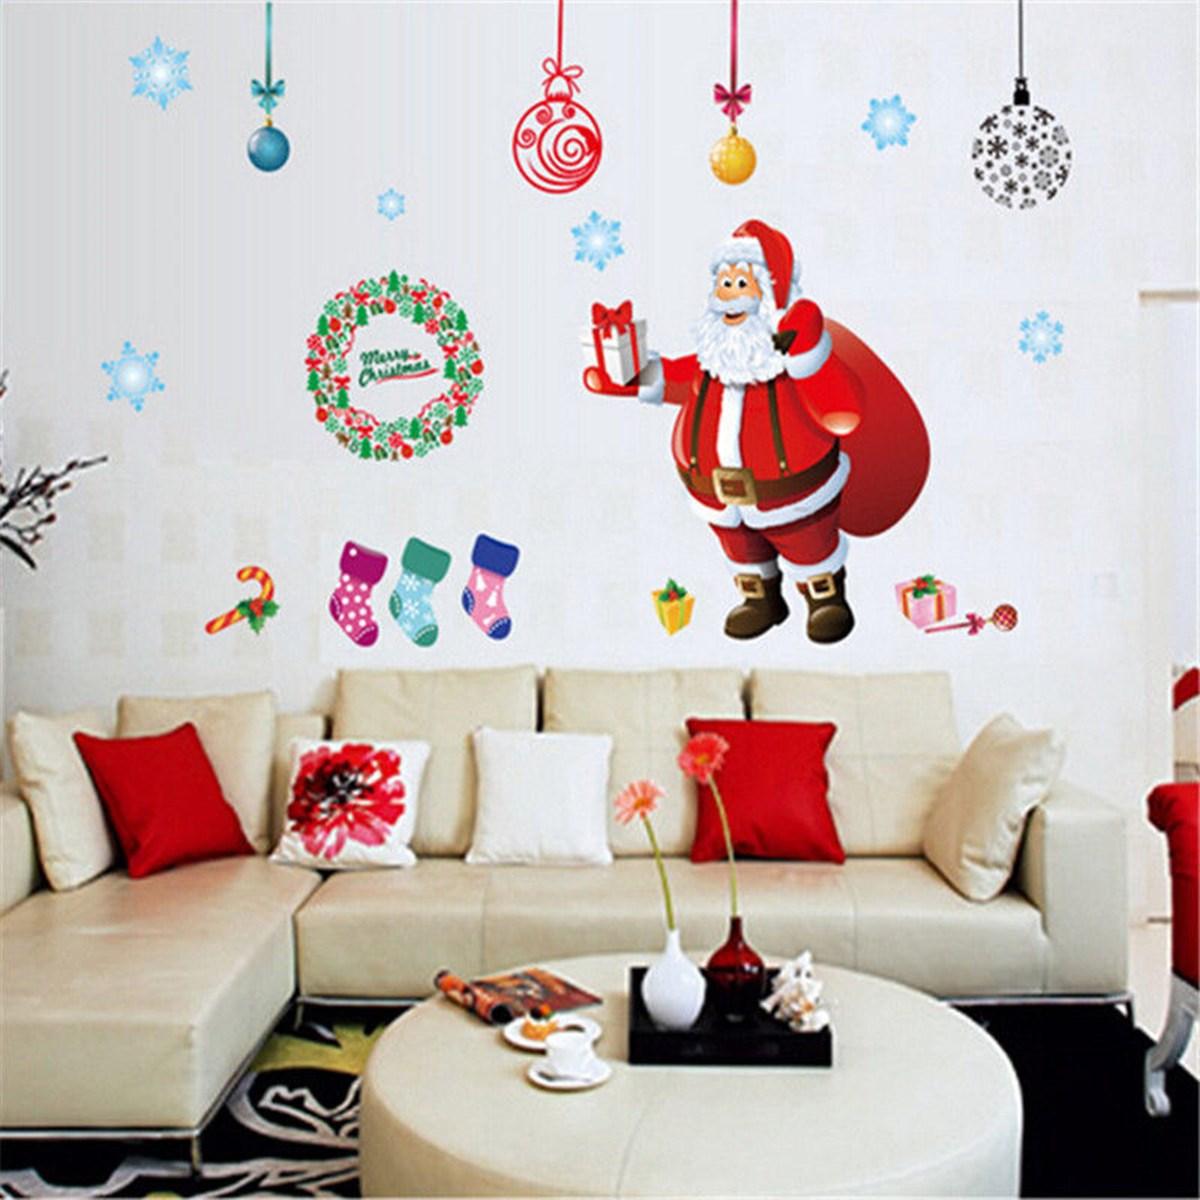 Wall Sticker Gift Winter Art Mural Window Christmas Tree Santa Claus Home Decor New Year Window